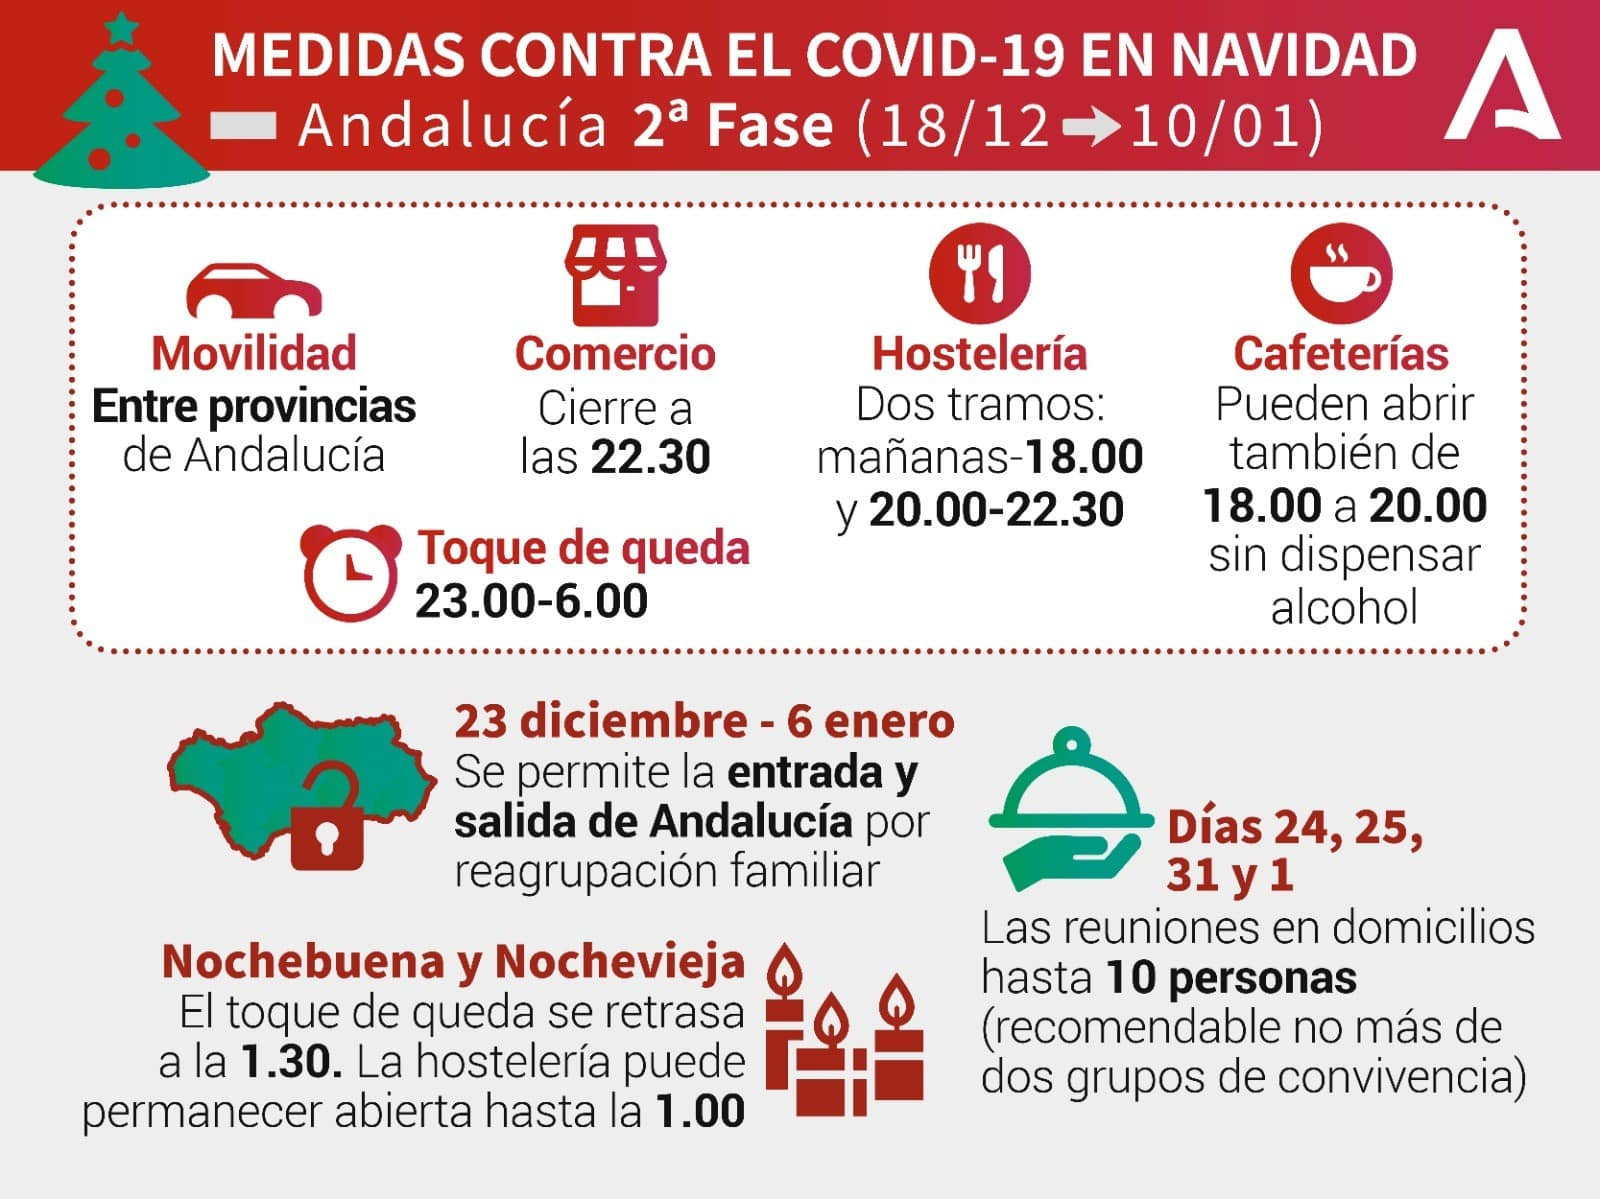 medidas-covid-navidad-2020-andalucia-21-12-2020